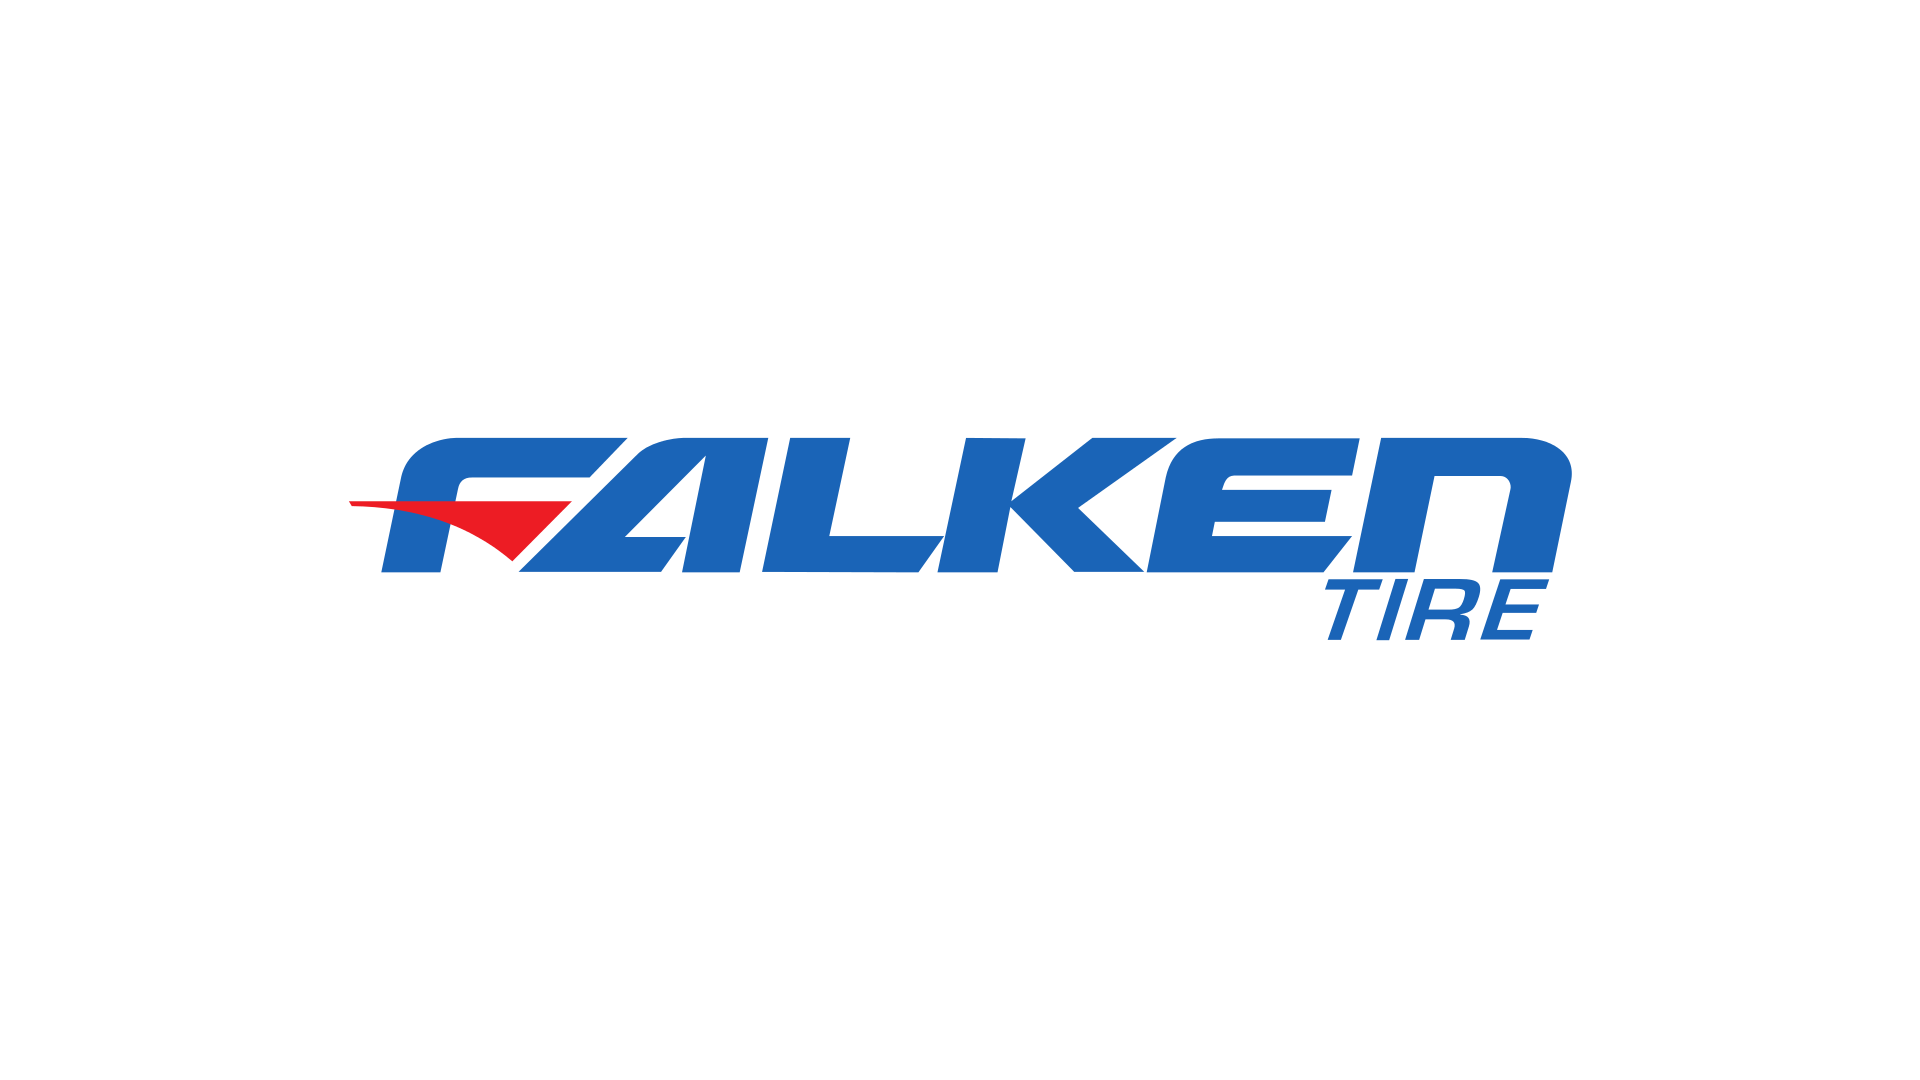 Falken-Tire-logo-1920x1080.png